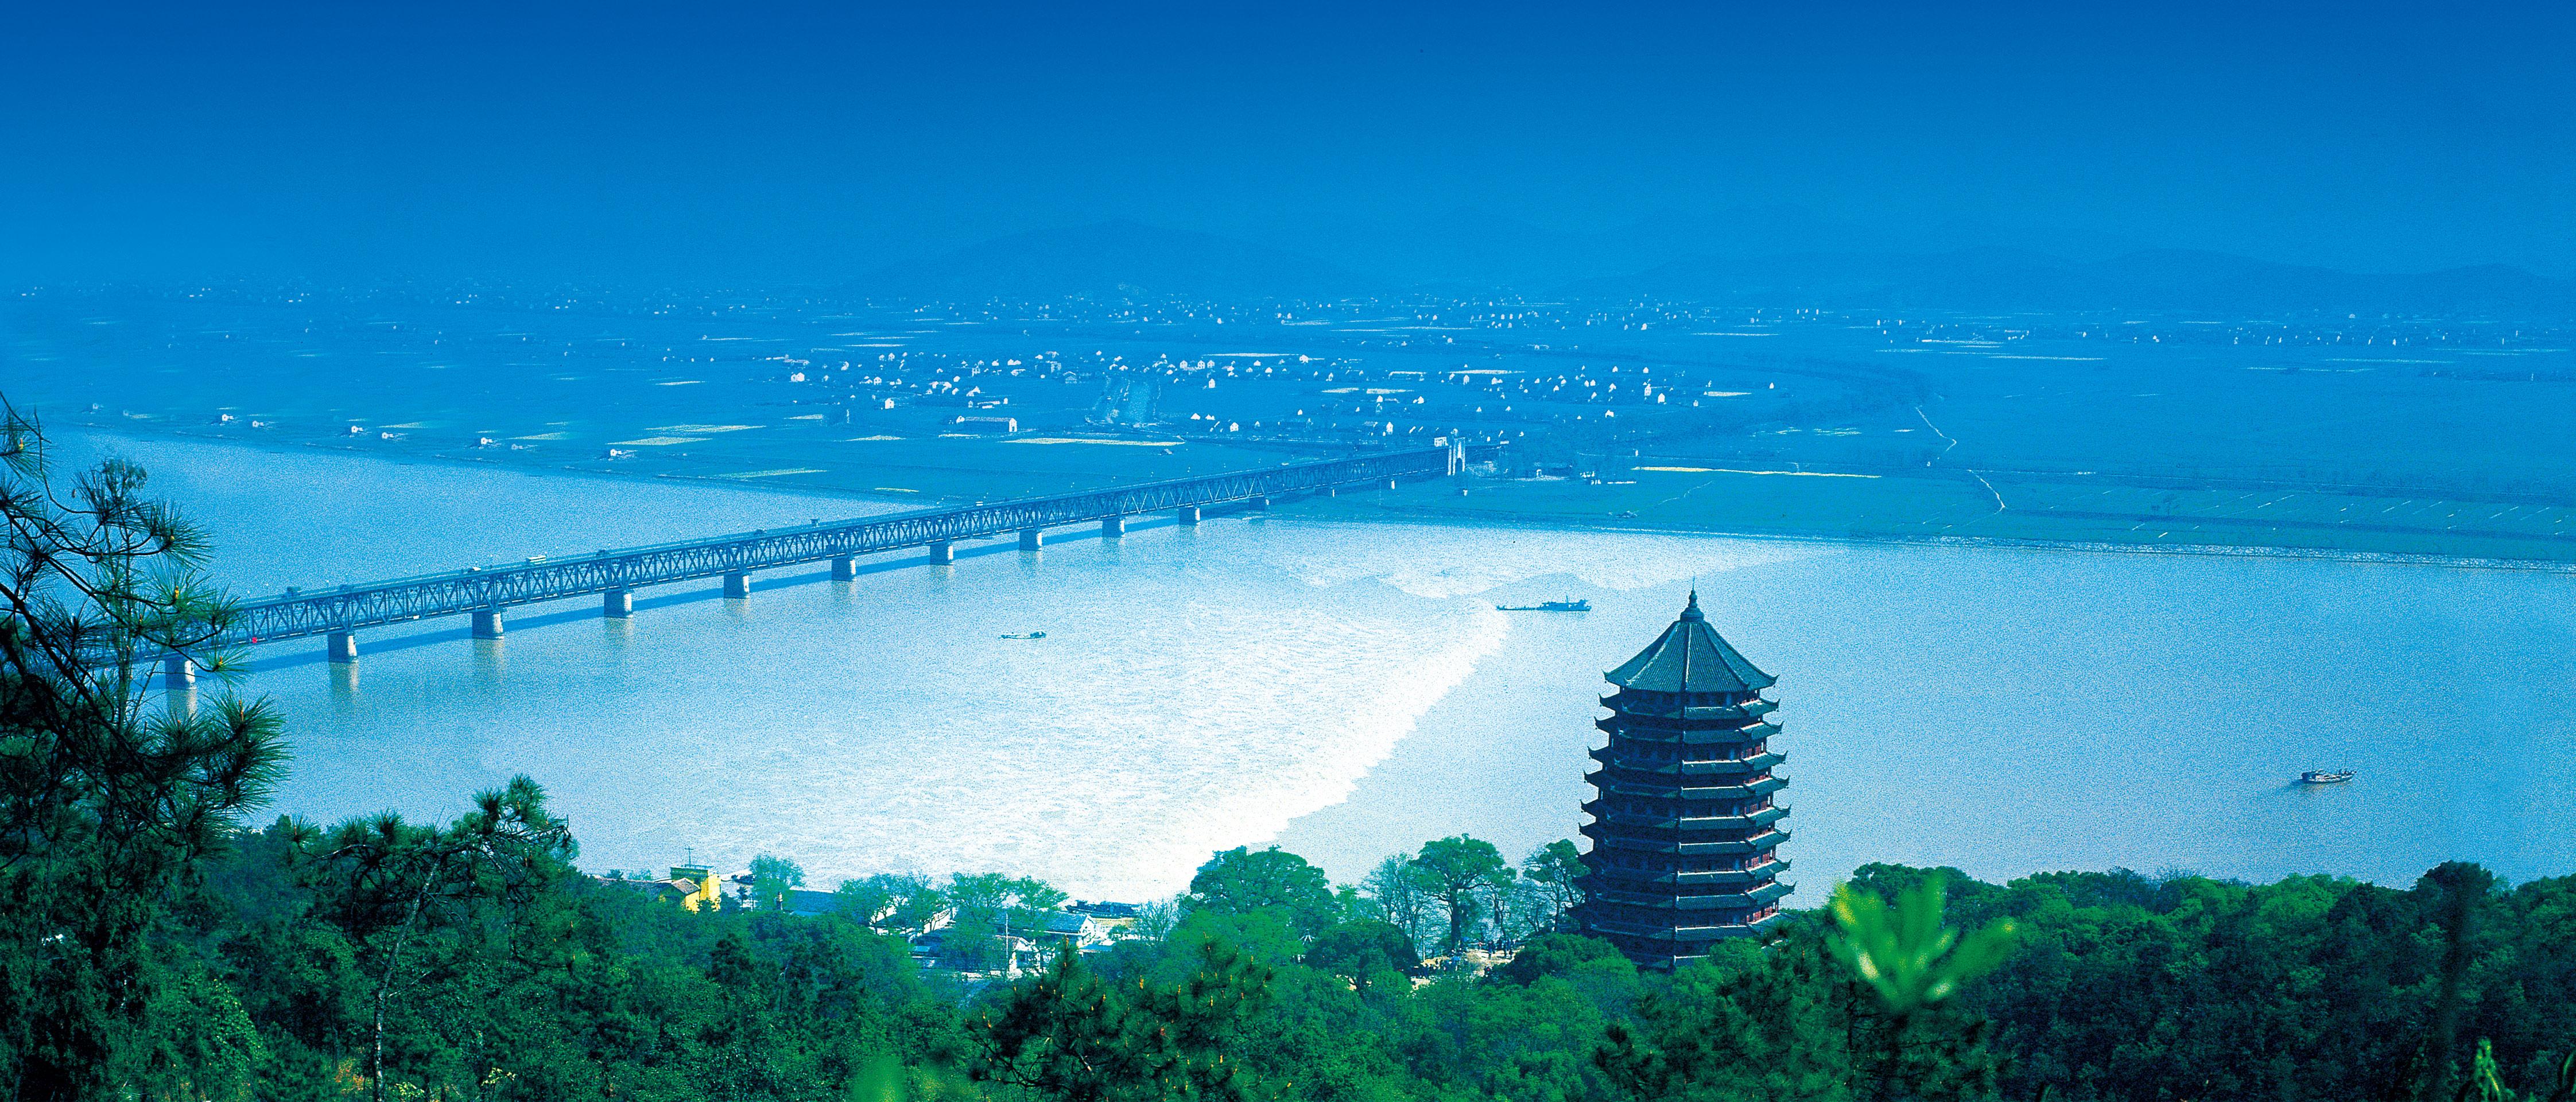 pagoda-of-six-harmonies-qiantang-river-tidesoaoaeioioe1uae%c2%a6%c2%b5%c2%a6%c6%92%c2%b5%c2%a2